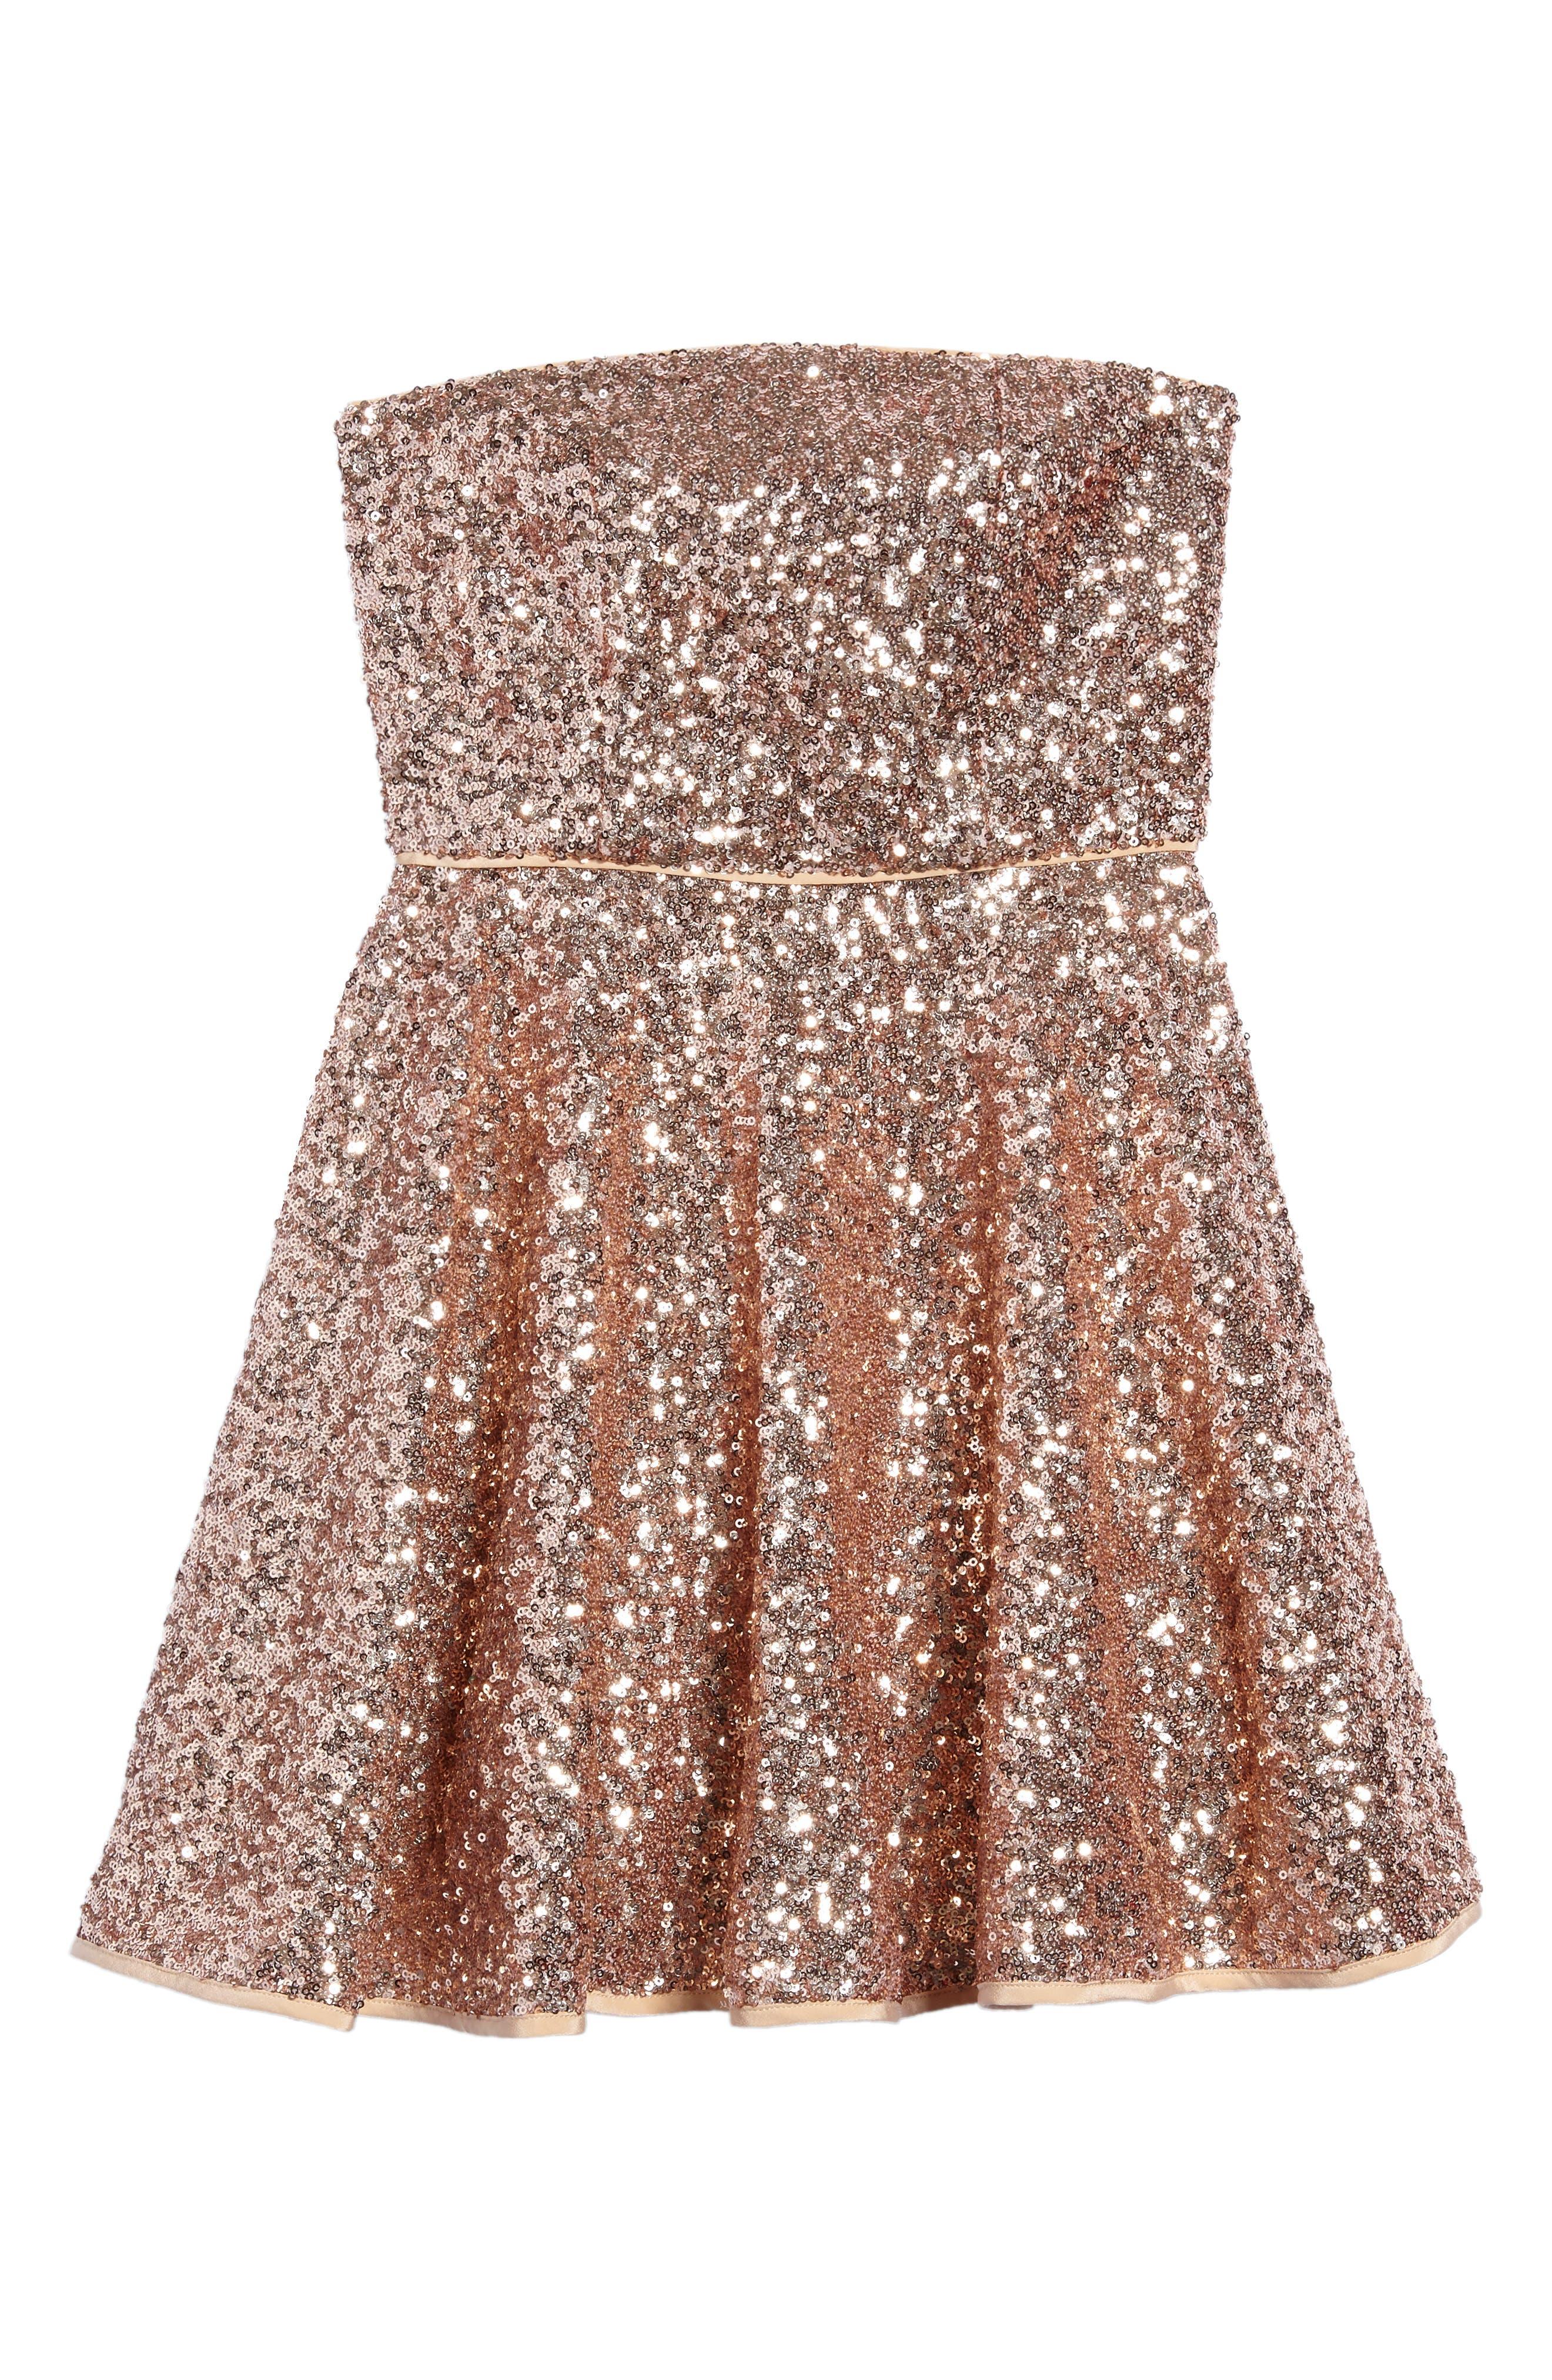 Alternate Image 1 Selected - Milly Minis Ellie Sequin Strapless Dress (Big Girls)